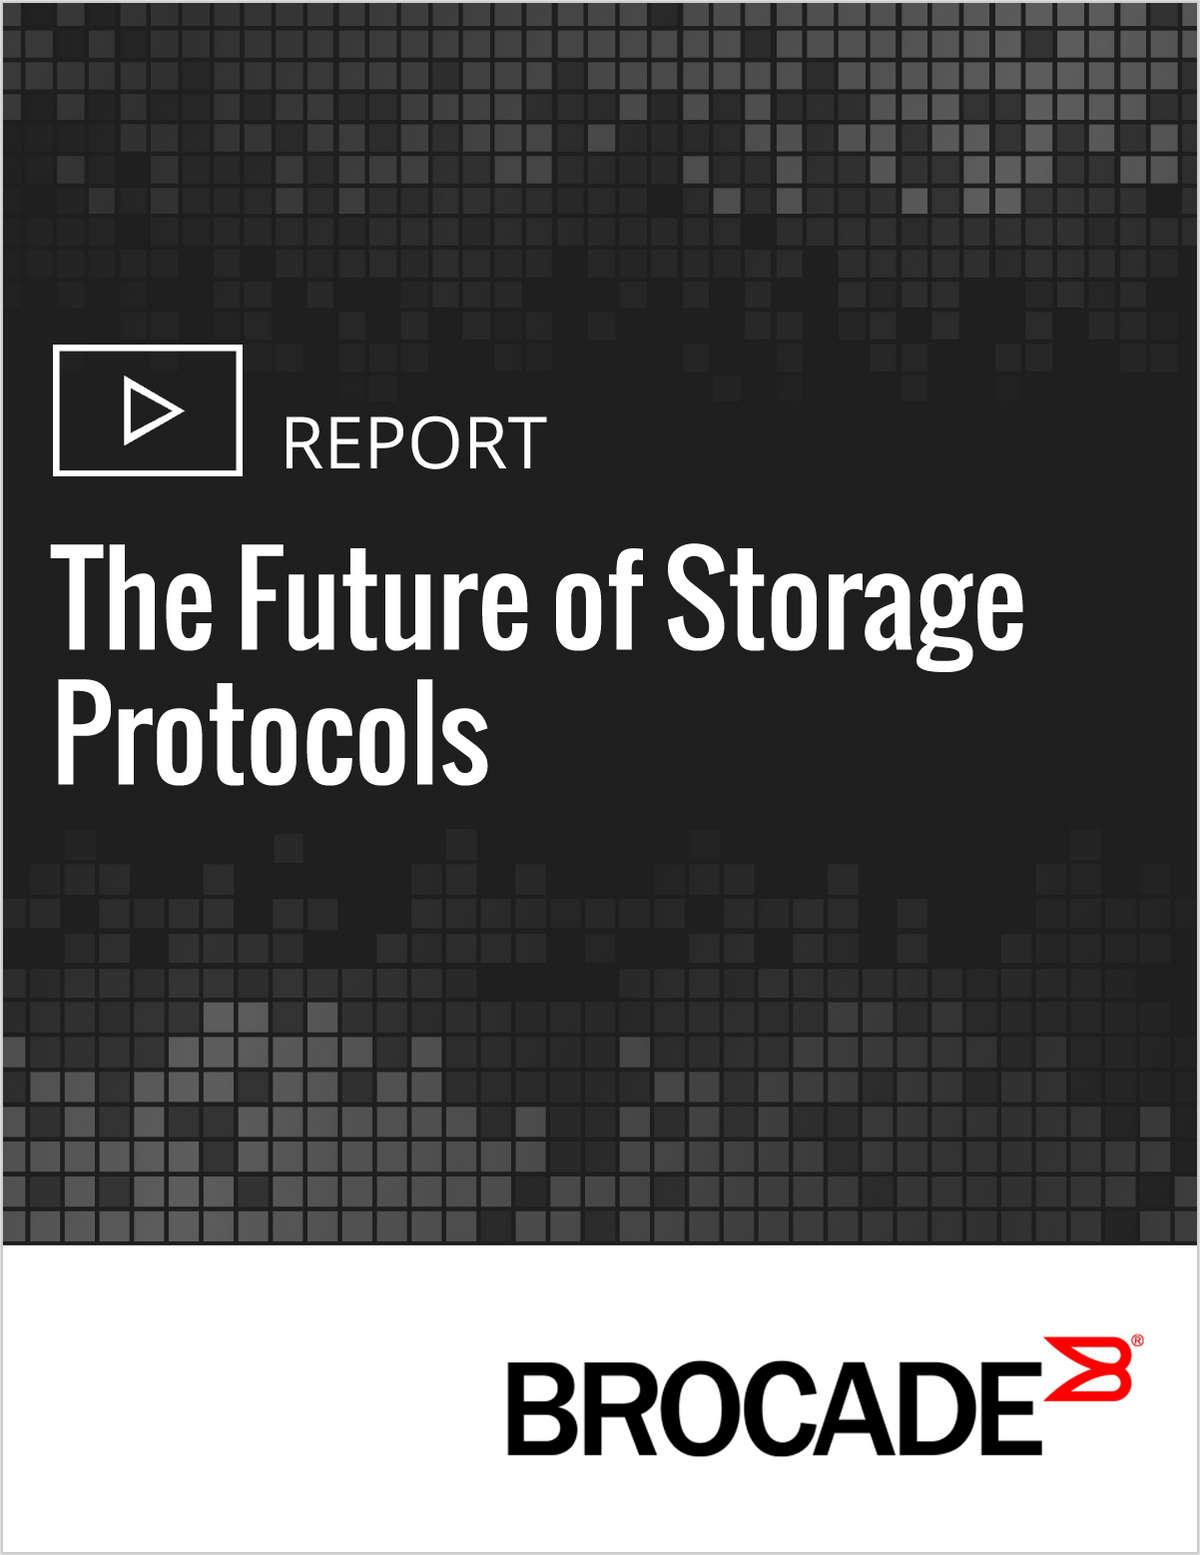 The Future of Storage Protocols